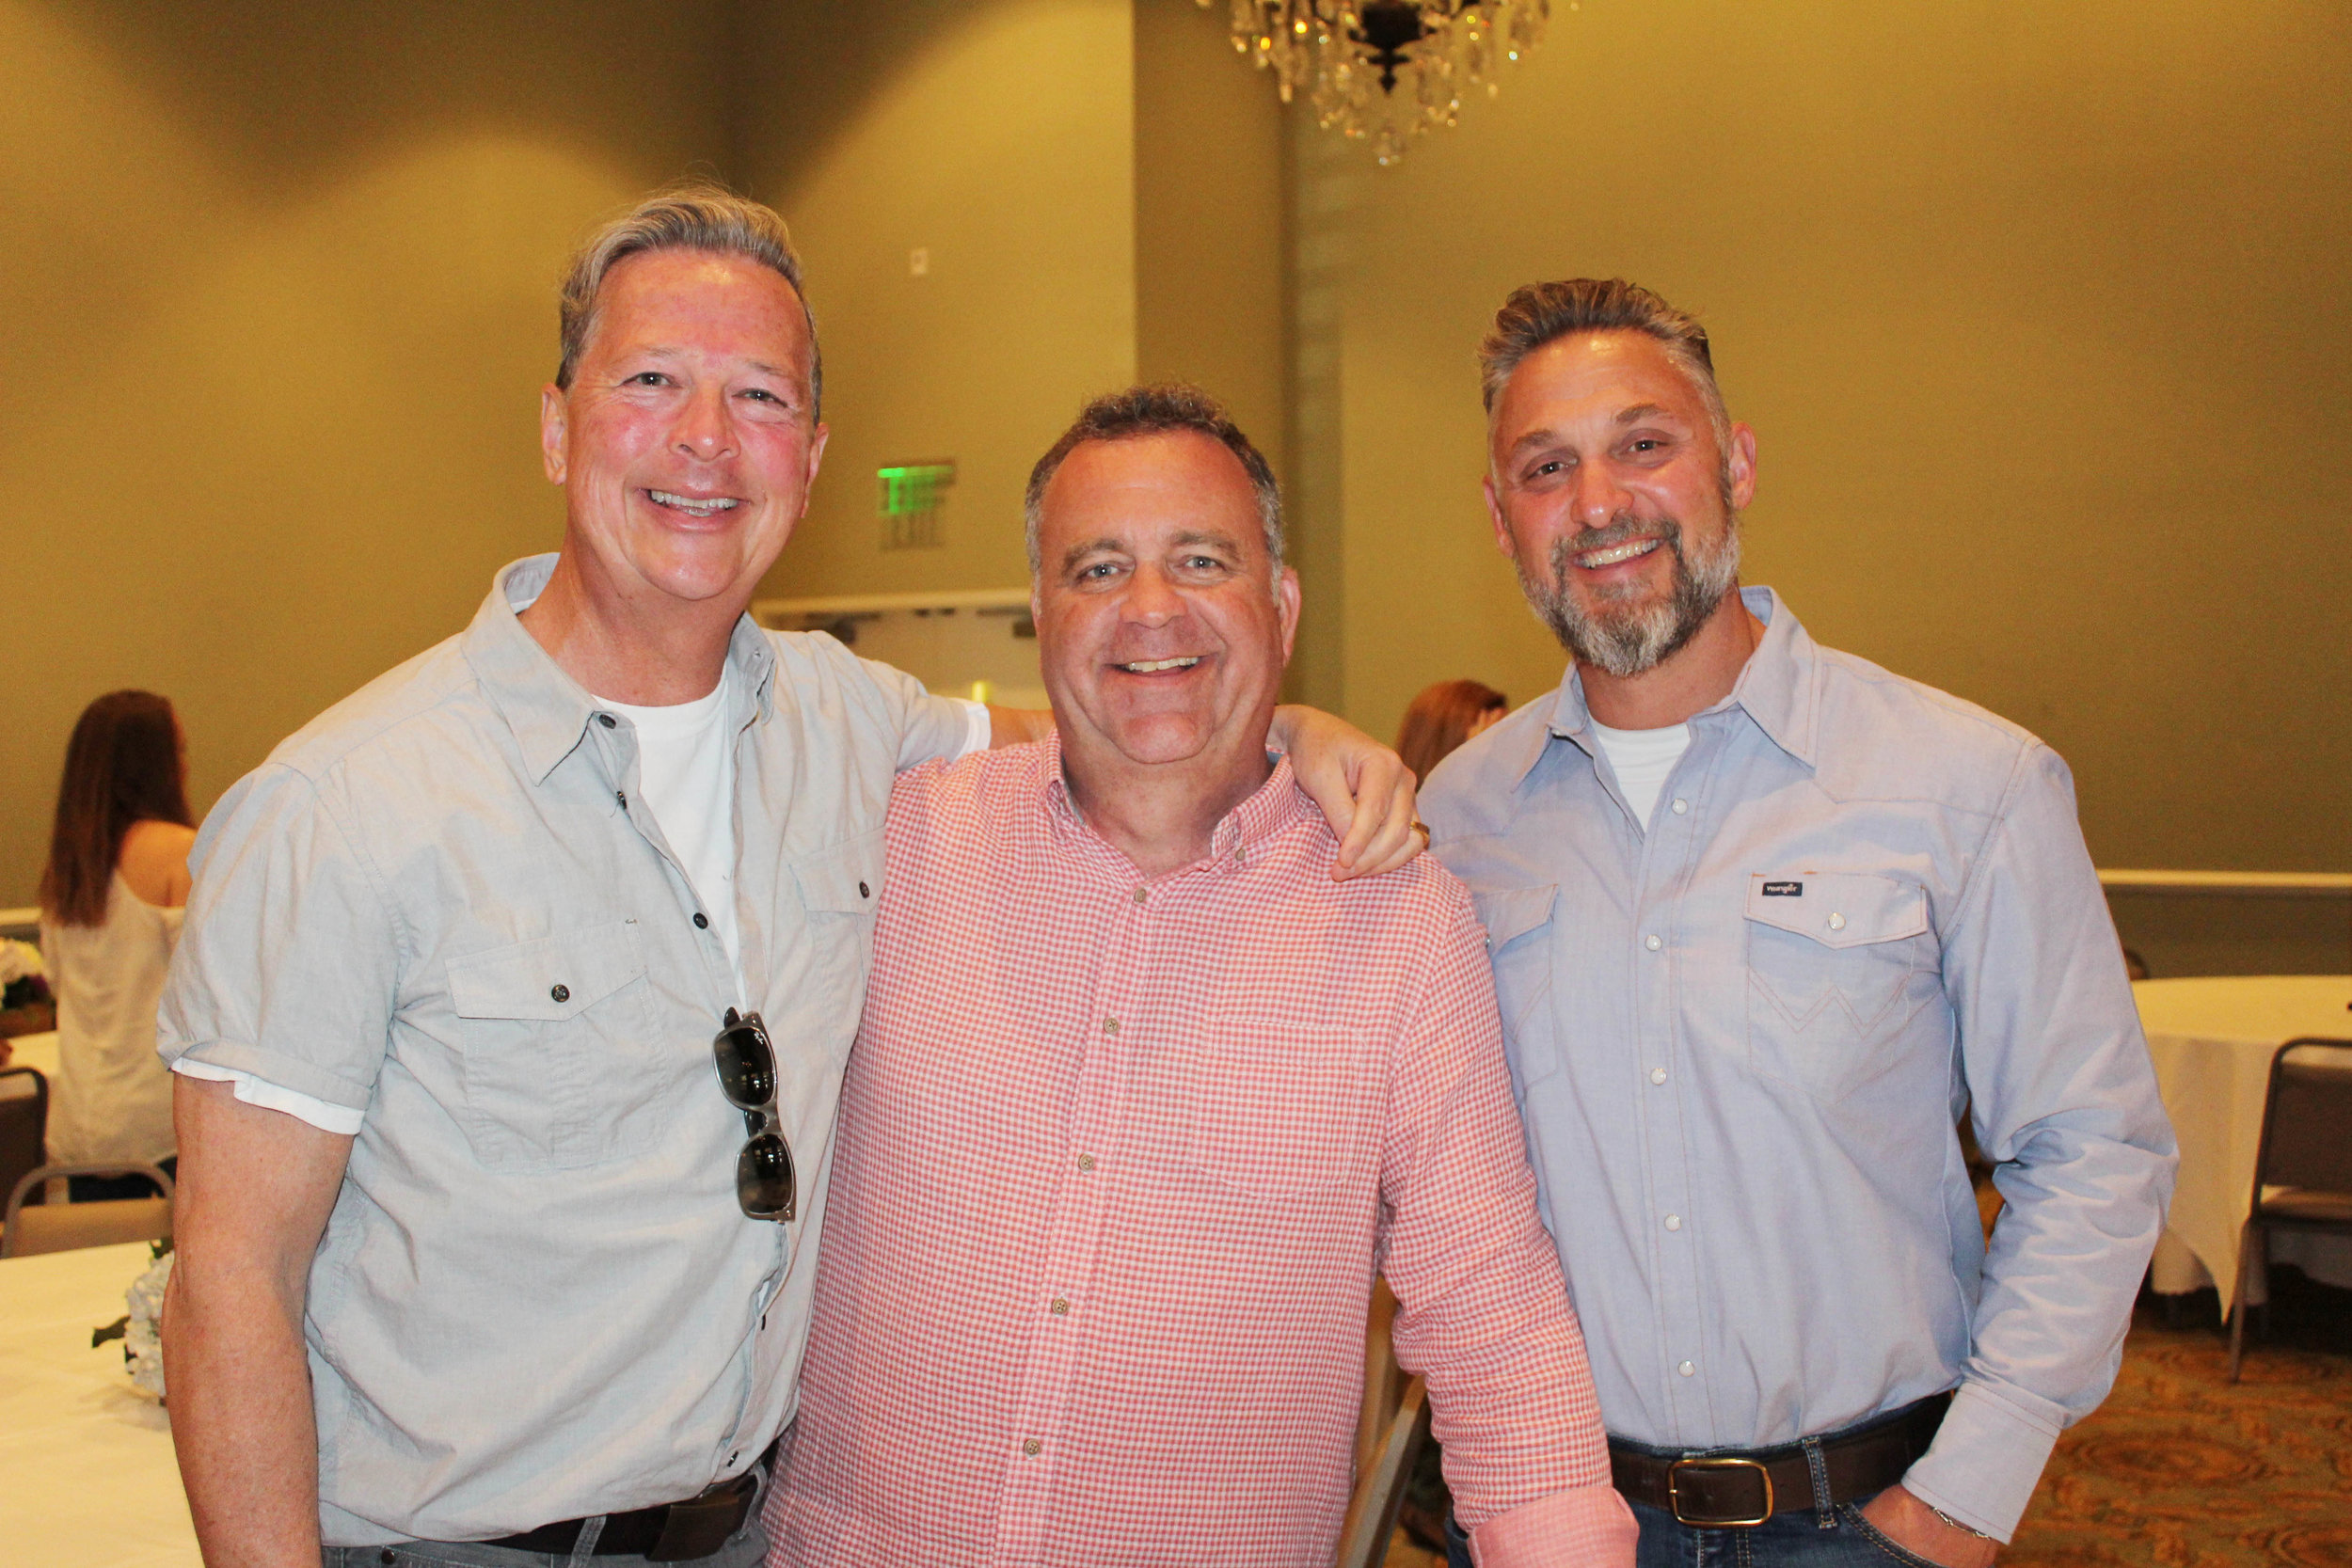 Jim Wyly, David McGonagill and Sean Rommel